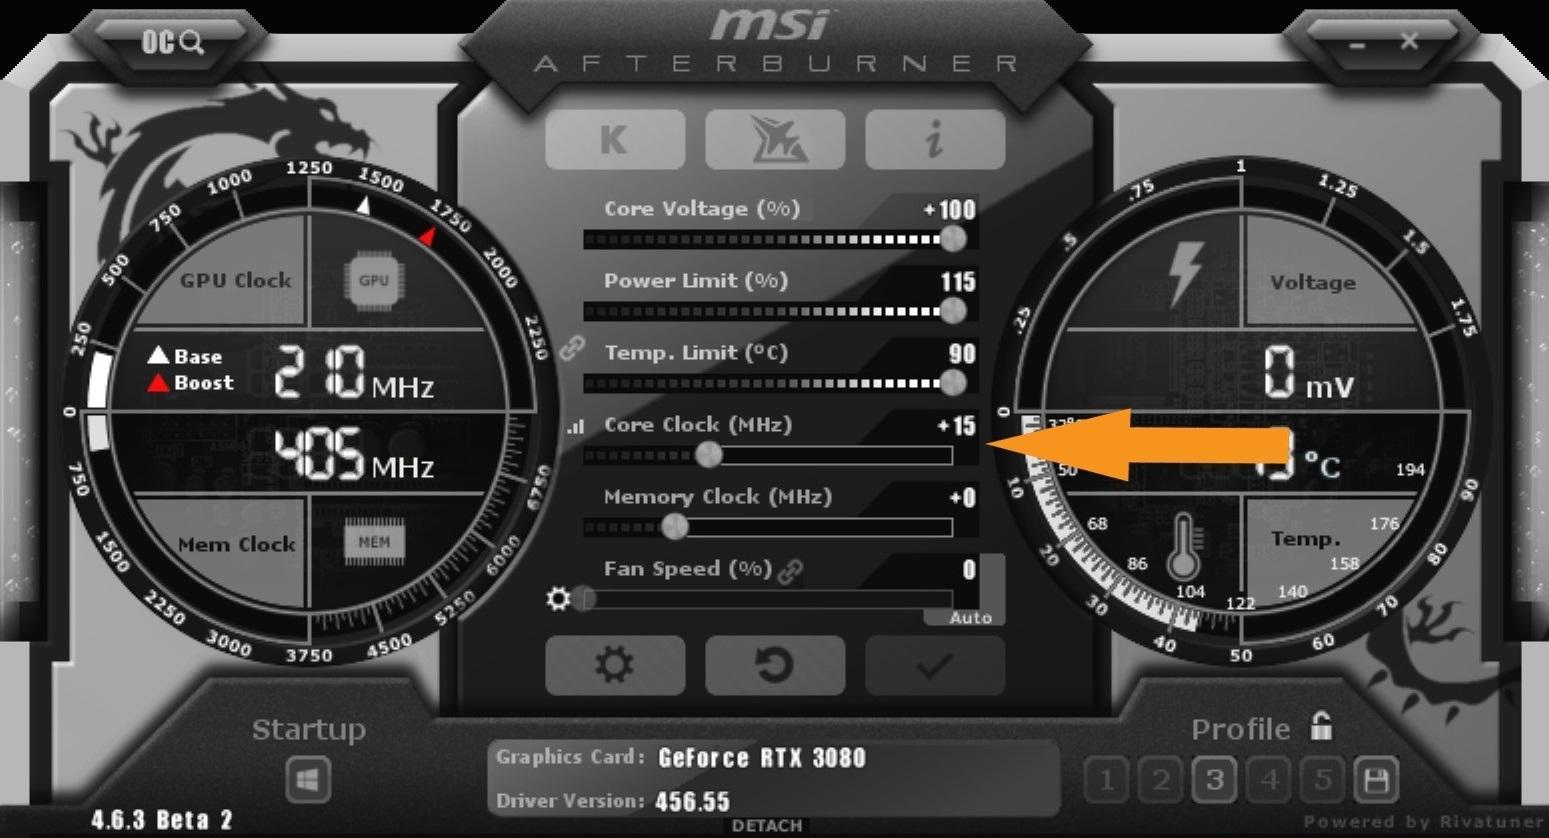 Nvidia Geforce Rtx 3080 Guide Overclocking Msi After Burner Core Clock Gpu